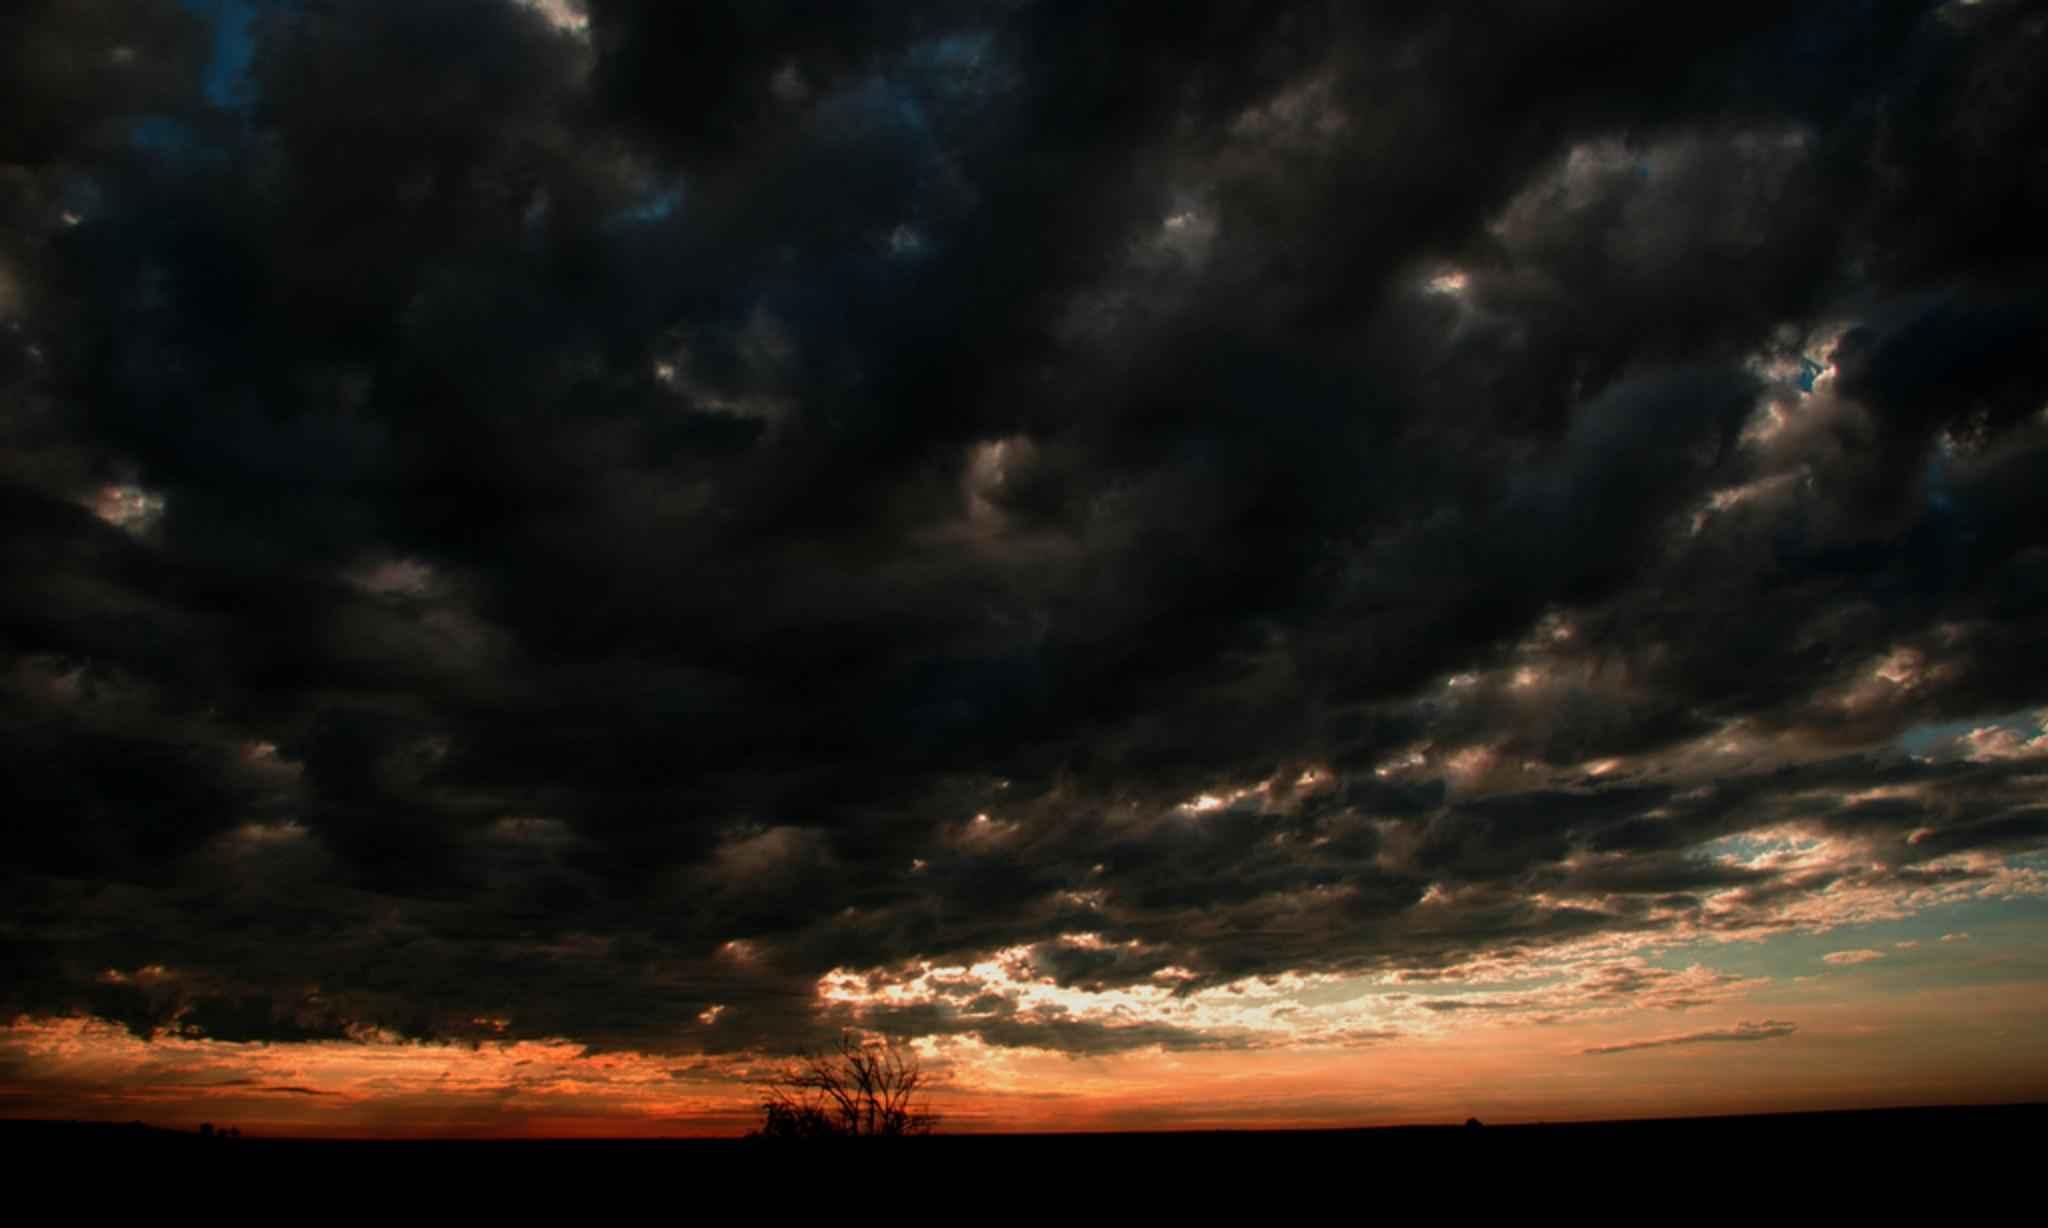 Картинки темного неба сошедшая